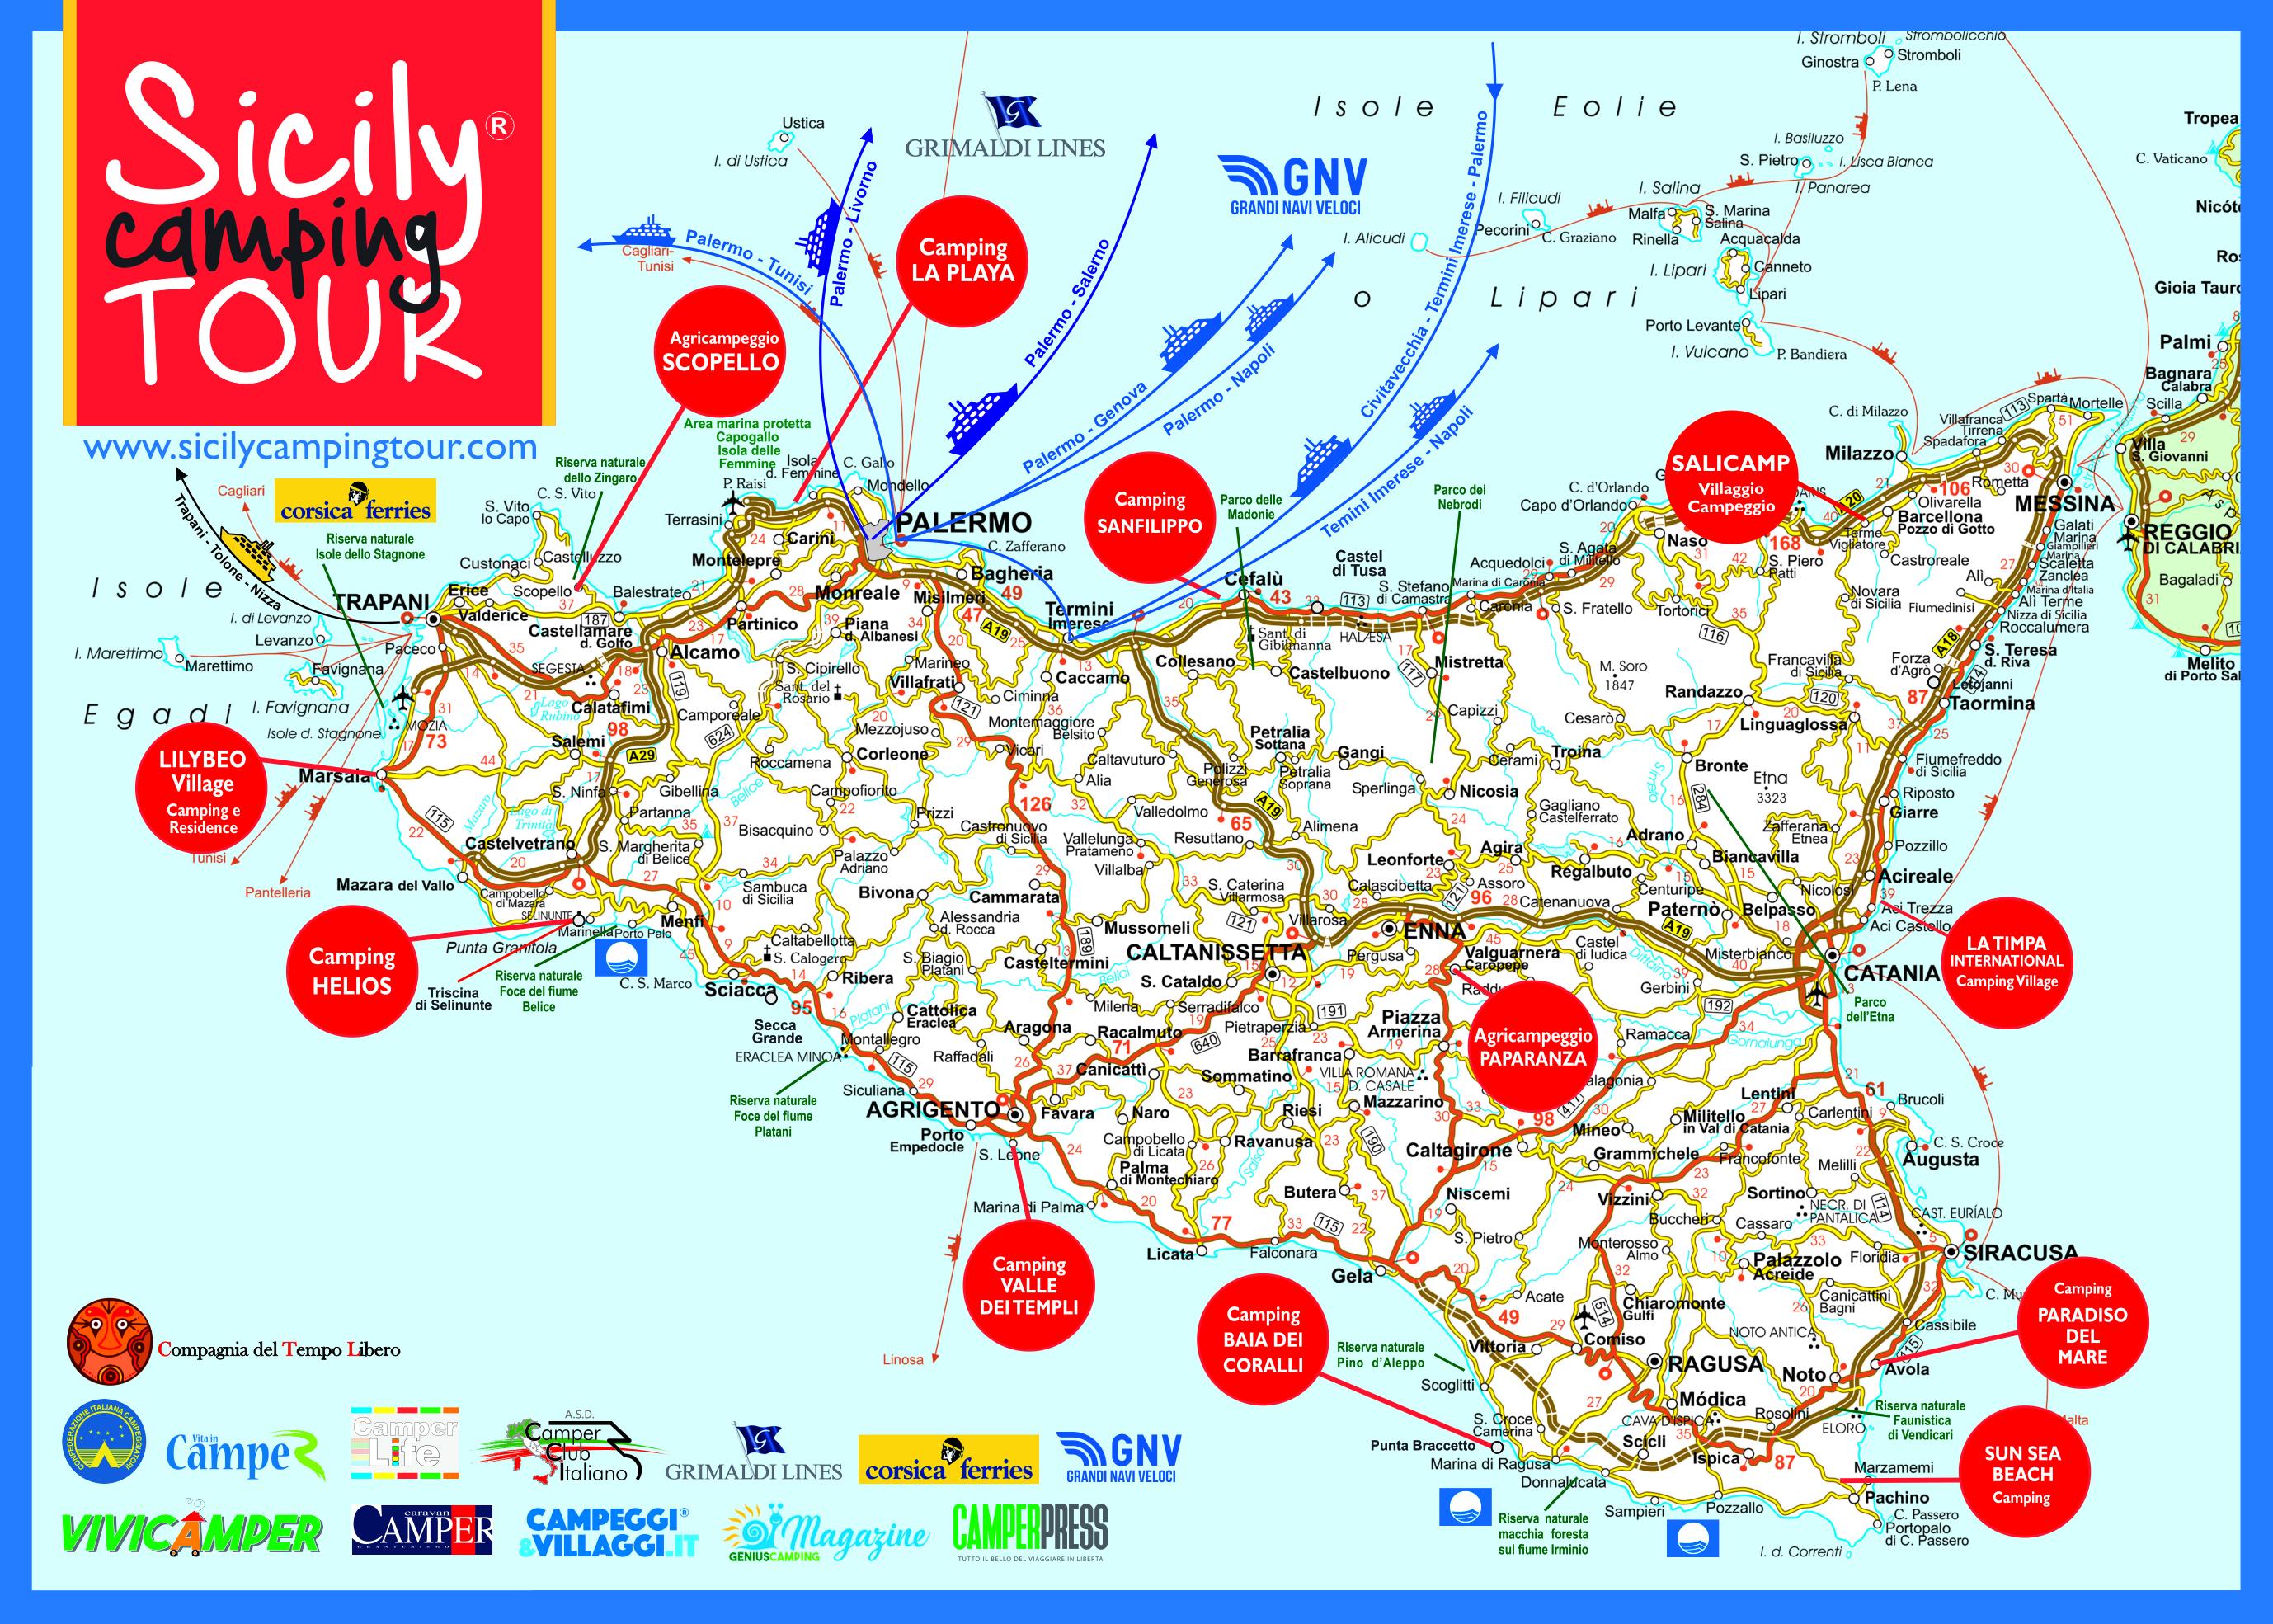 Cartina Sicilia Turistica.Sicilia